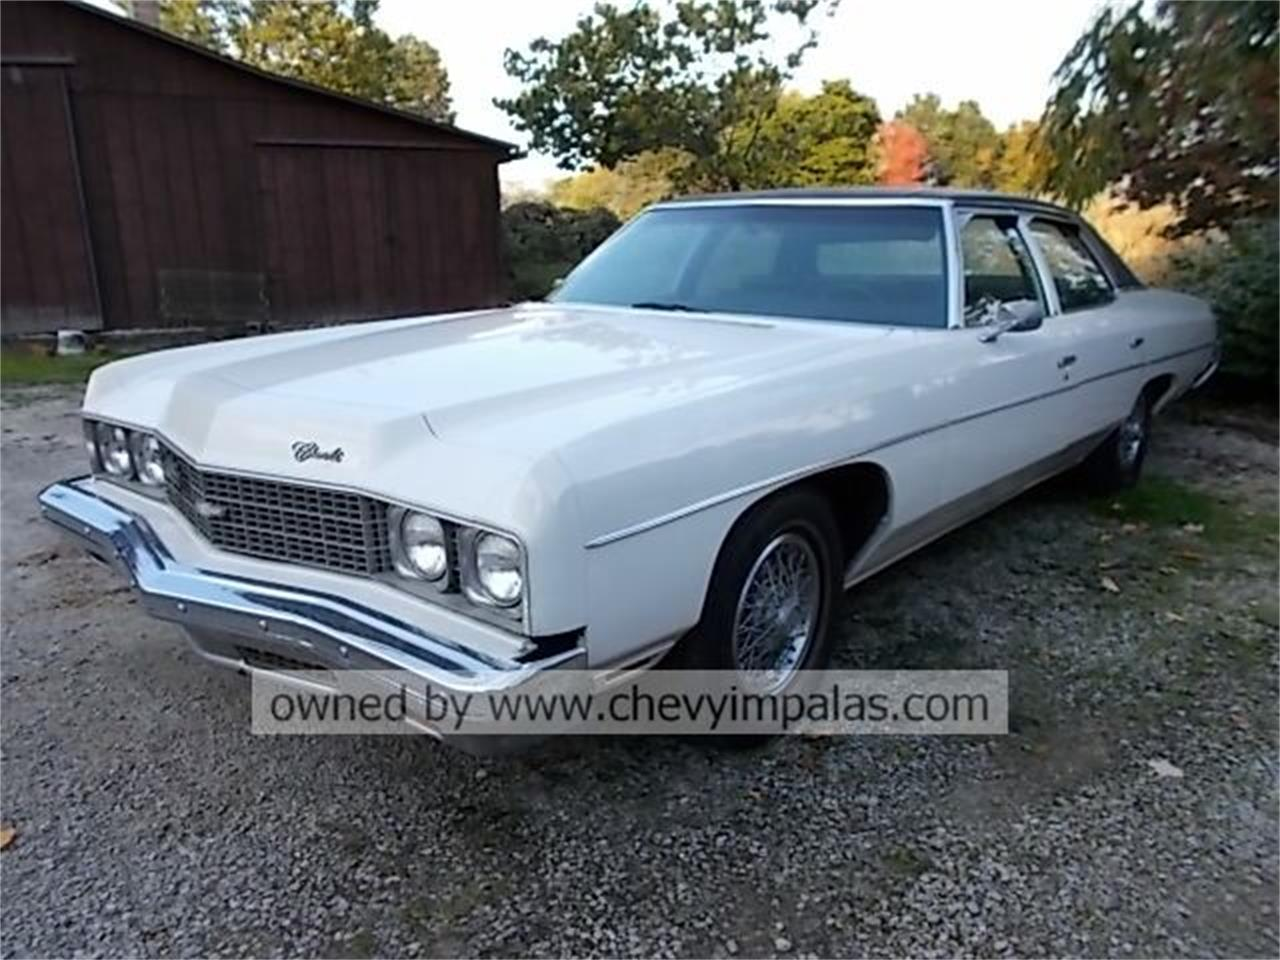 For Sale 1973 Chevrolet Impala 4 Door In Creston Ohio